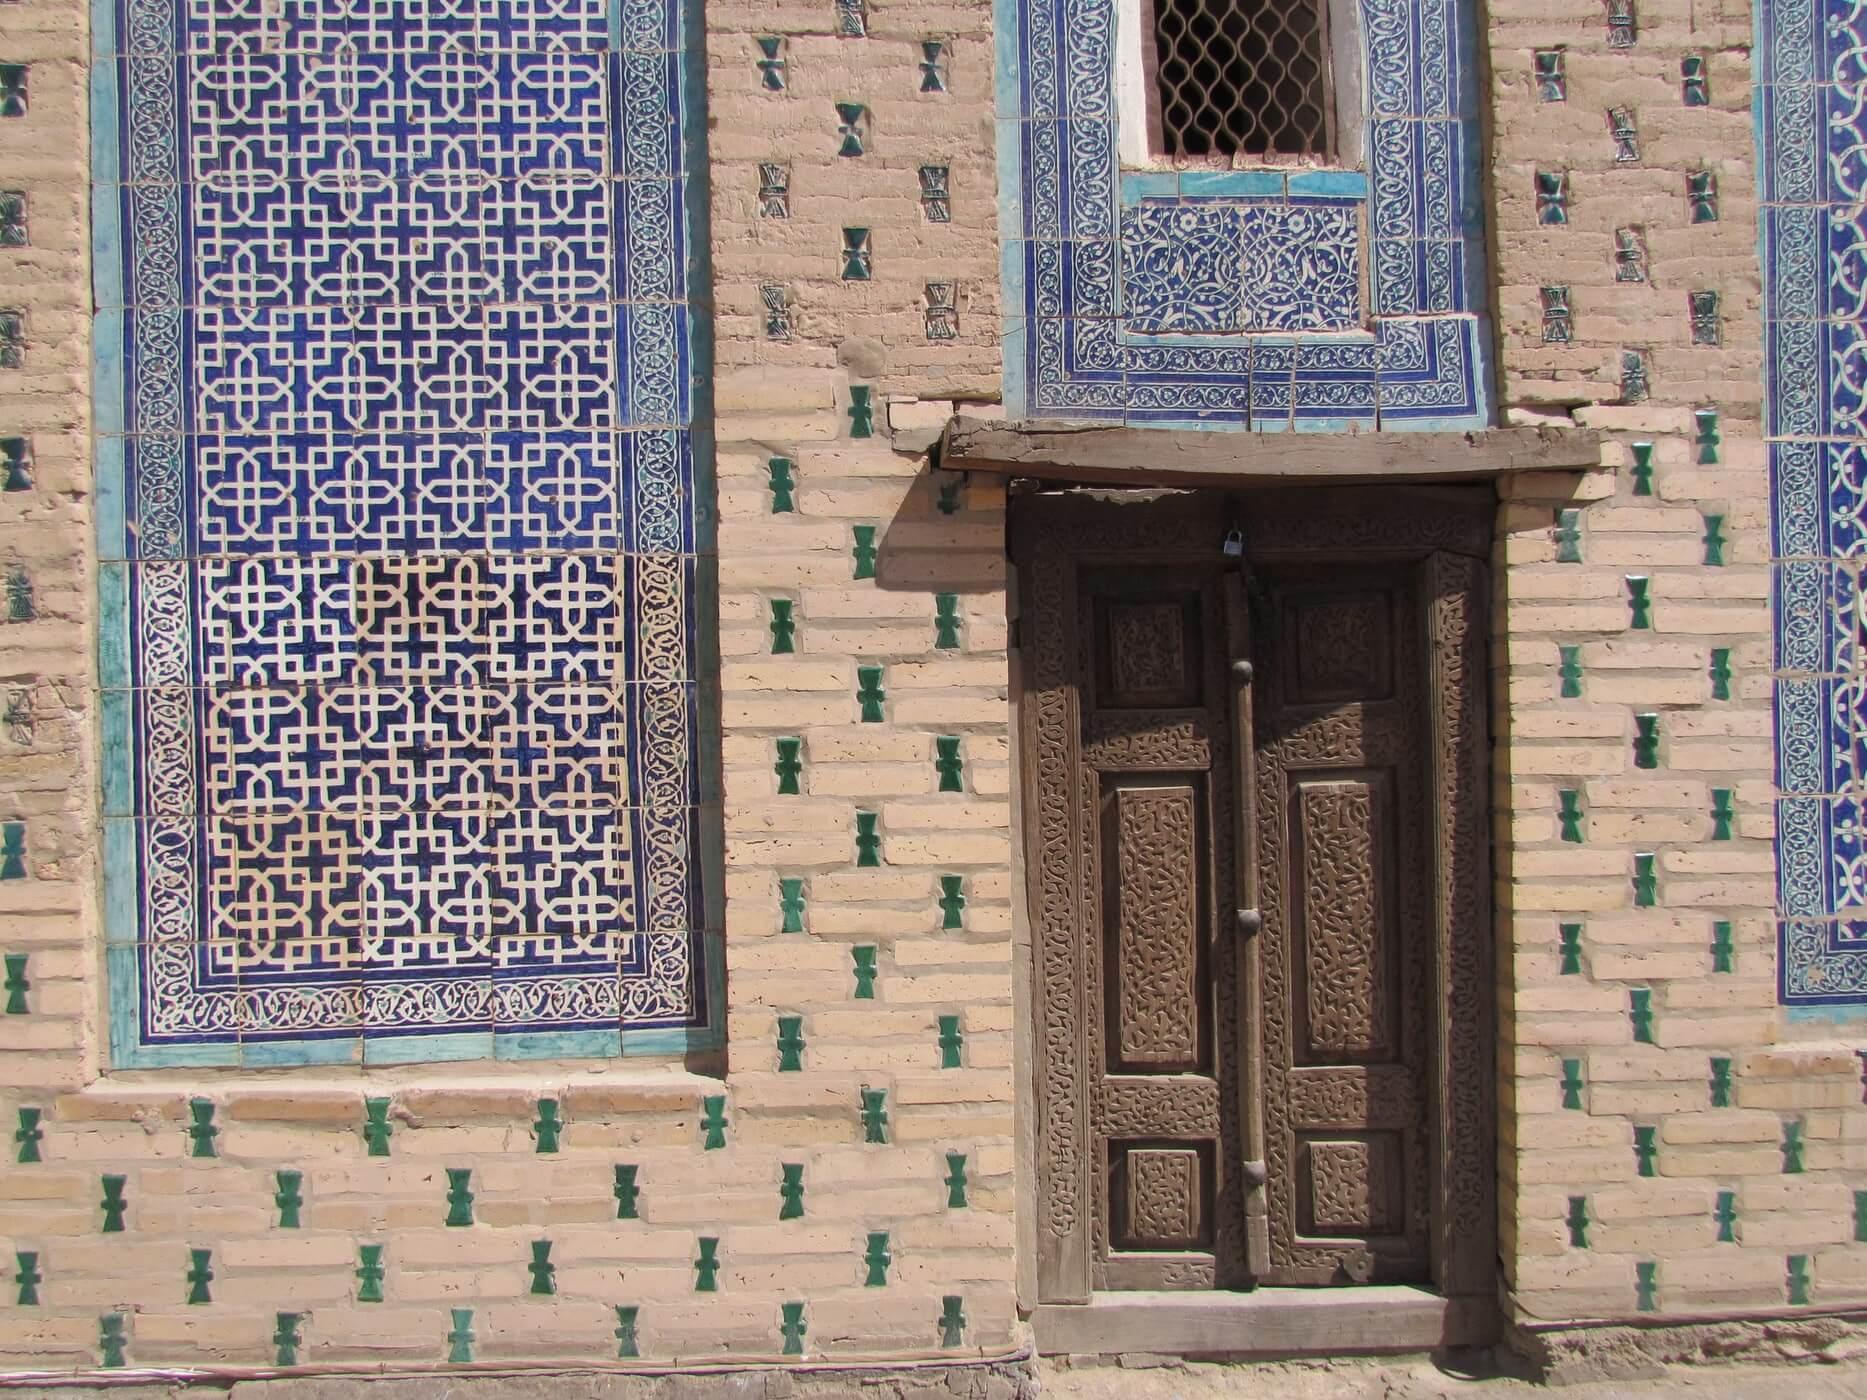 Узбекистан заплатит 3000 $ туристу, если он заразится вирусом